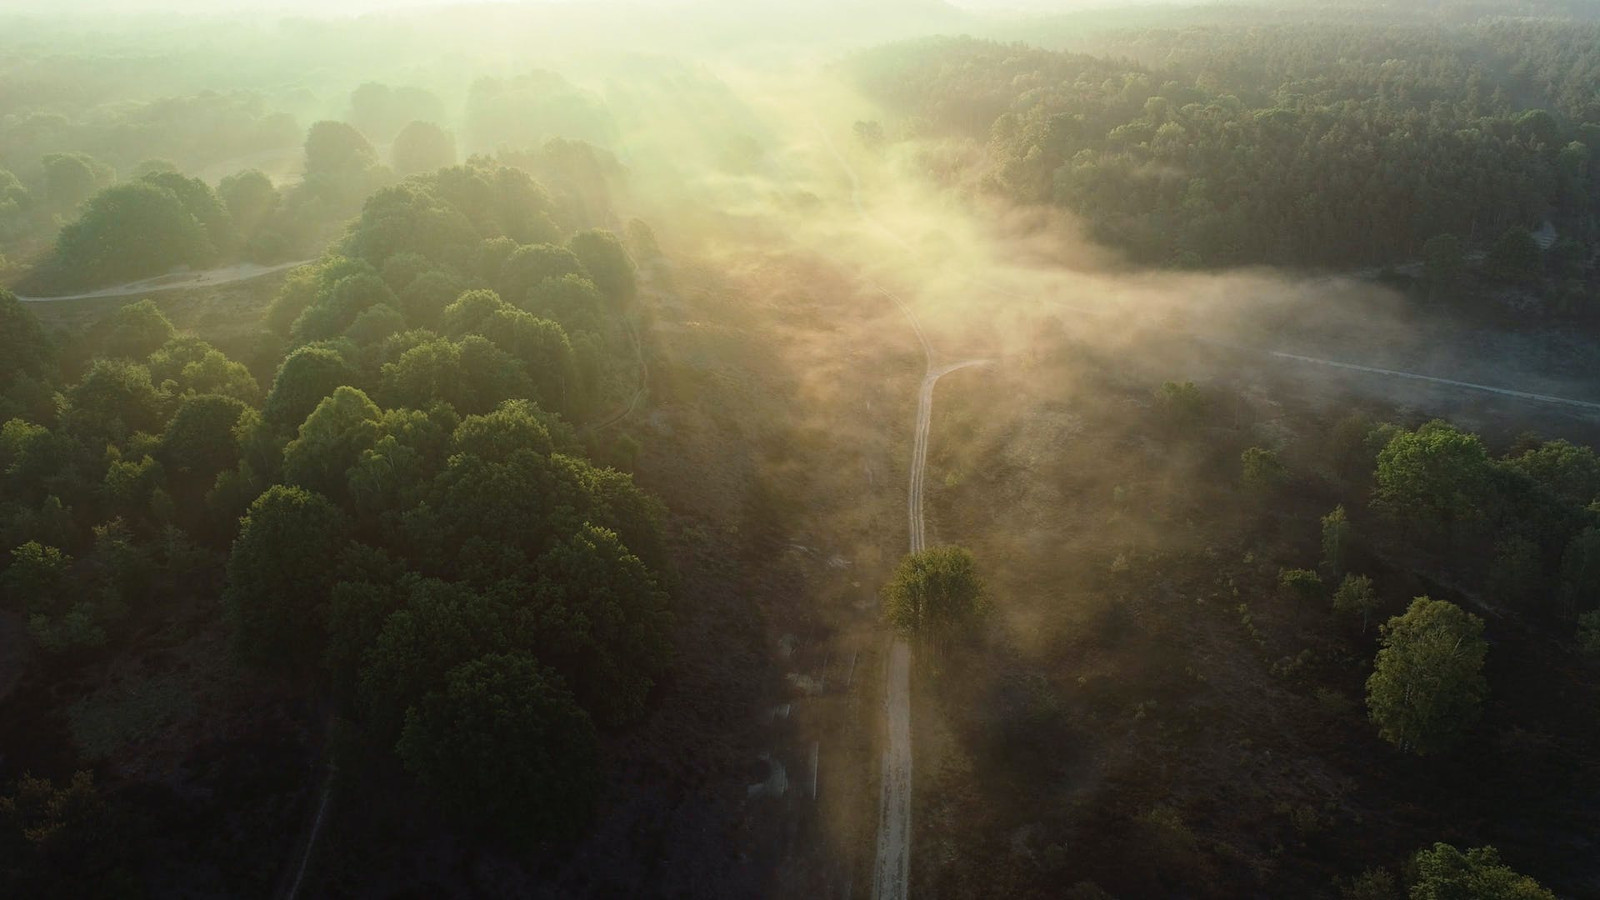 Nationaal Park Hoge Kempen.